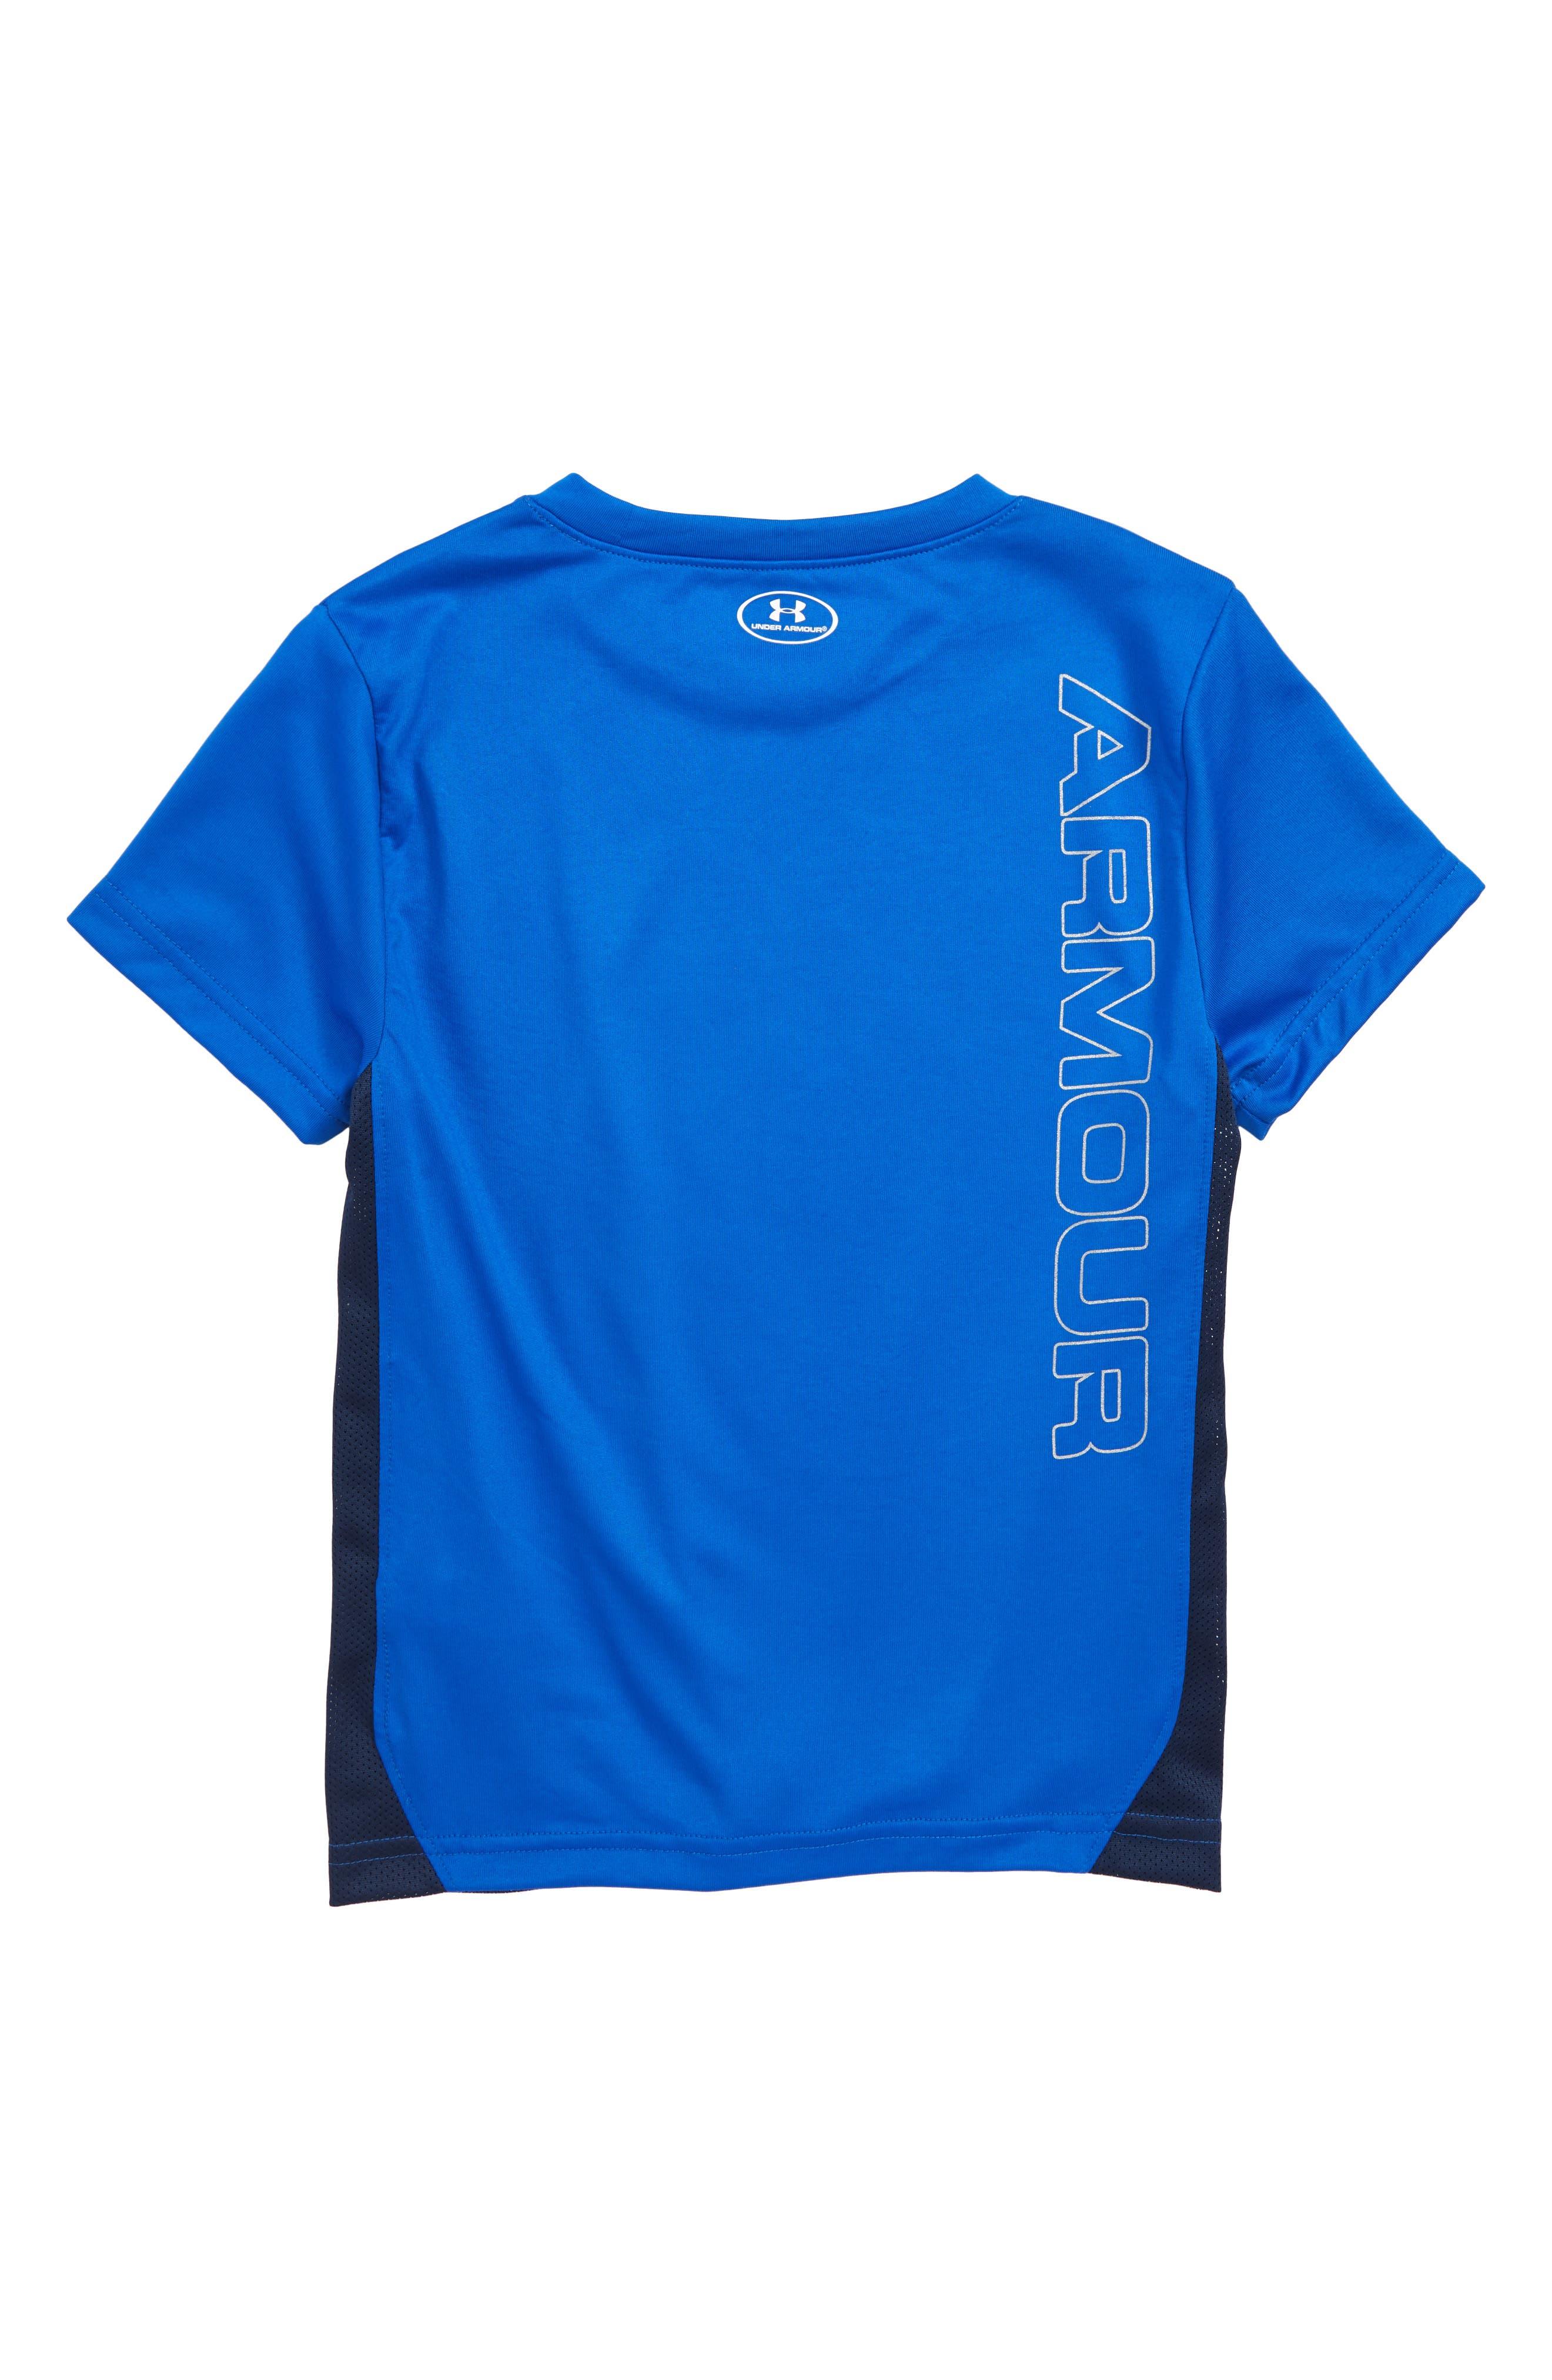 Mesh Tech HeatGear<sup>®</sup> T-Shirt,                             Alternate thumbnail 2, color,                             Ultra Blue